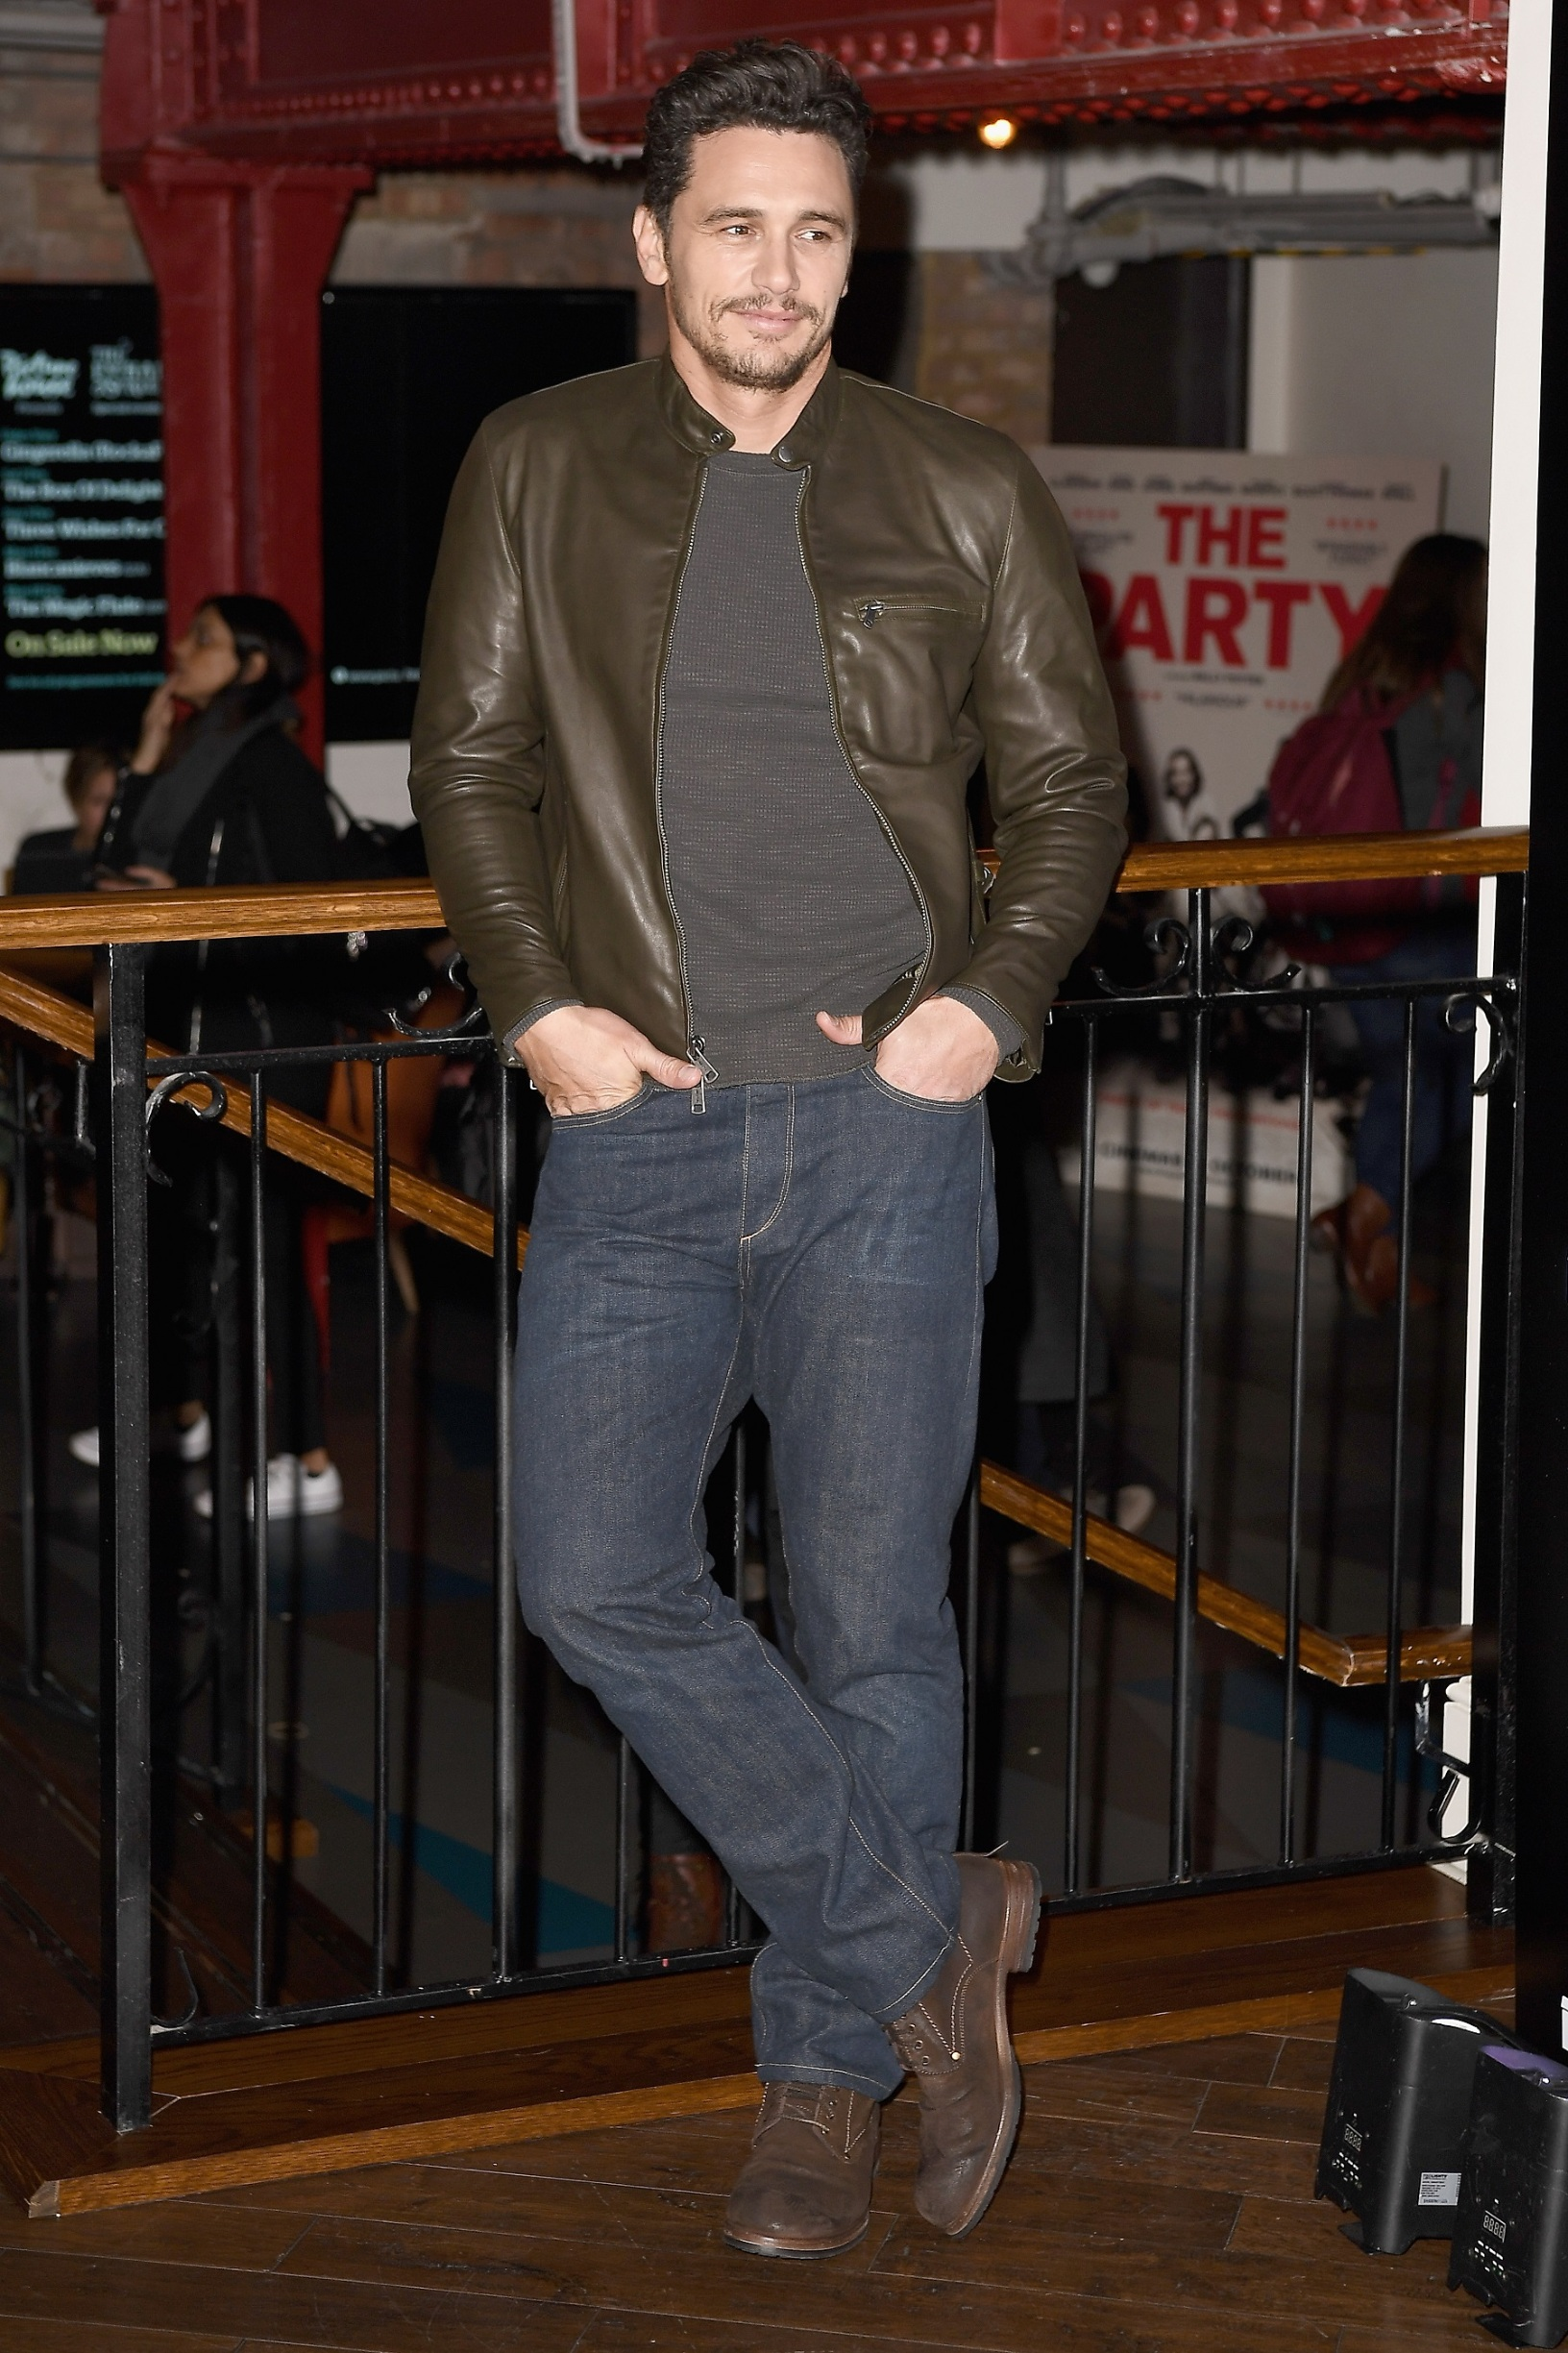 LONDON, ENGLAND - NOVEMBER 22:  James Franco attends a screening of